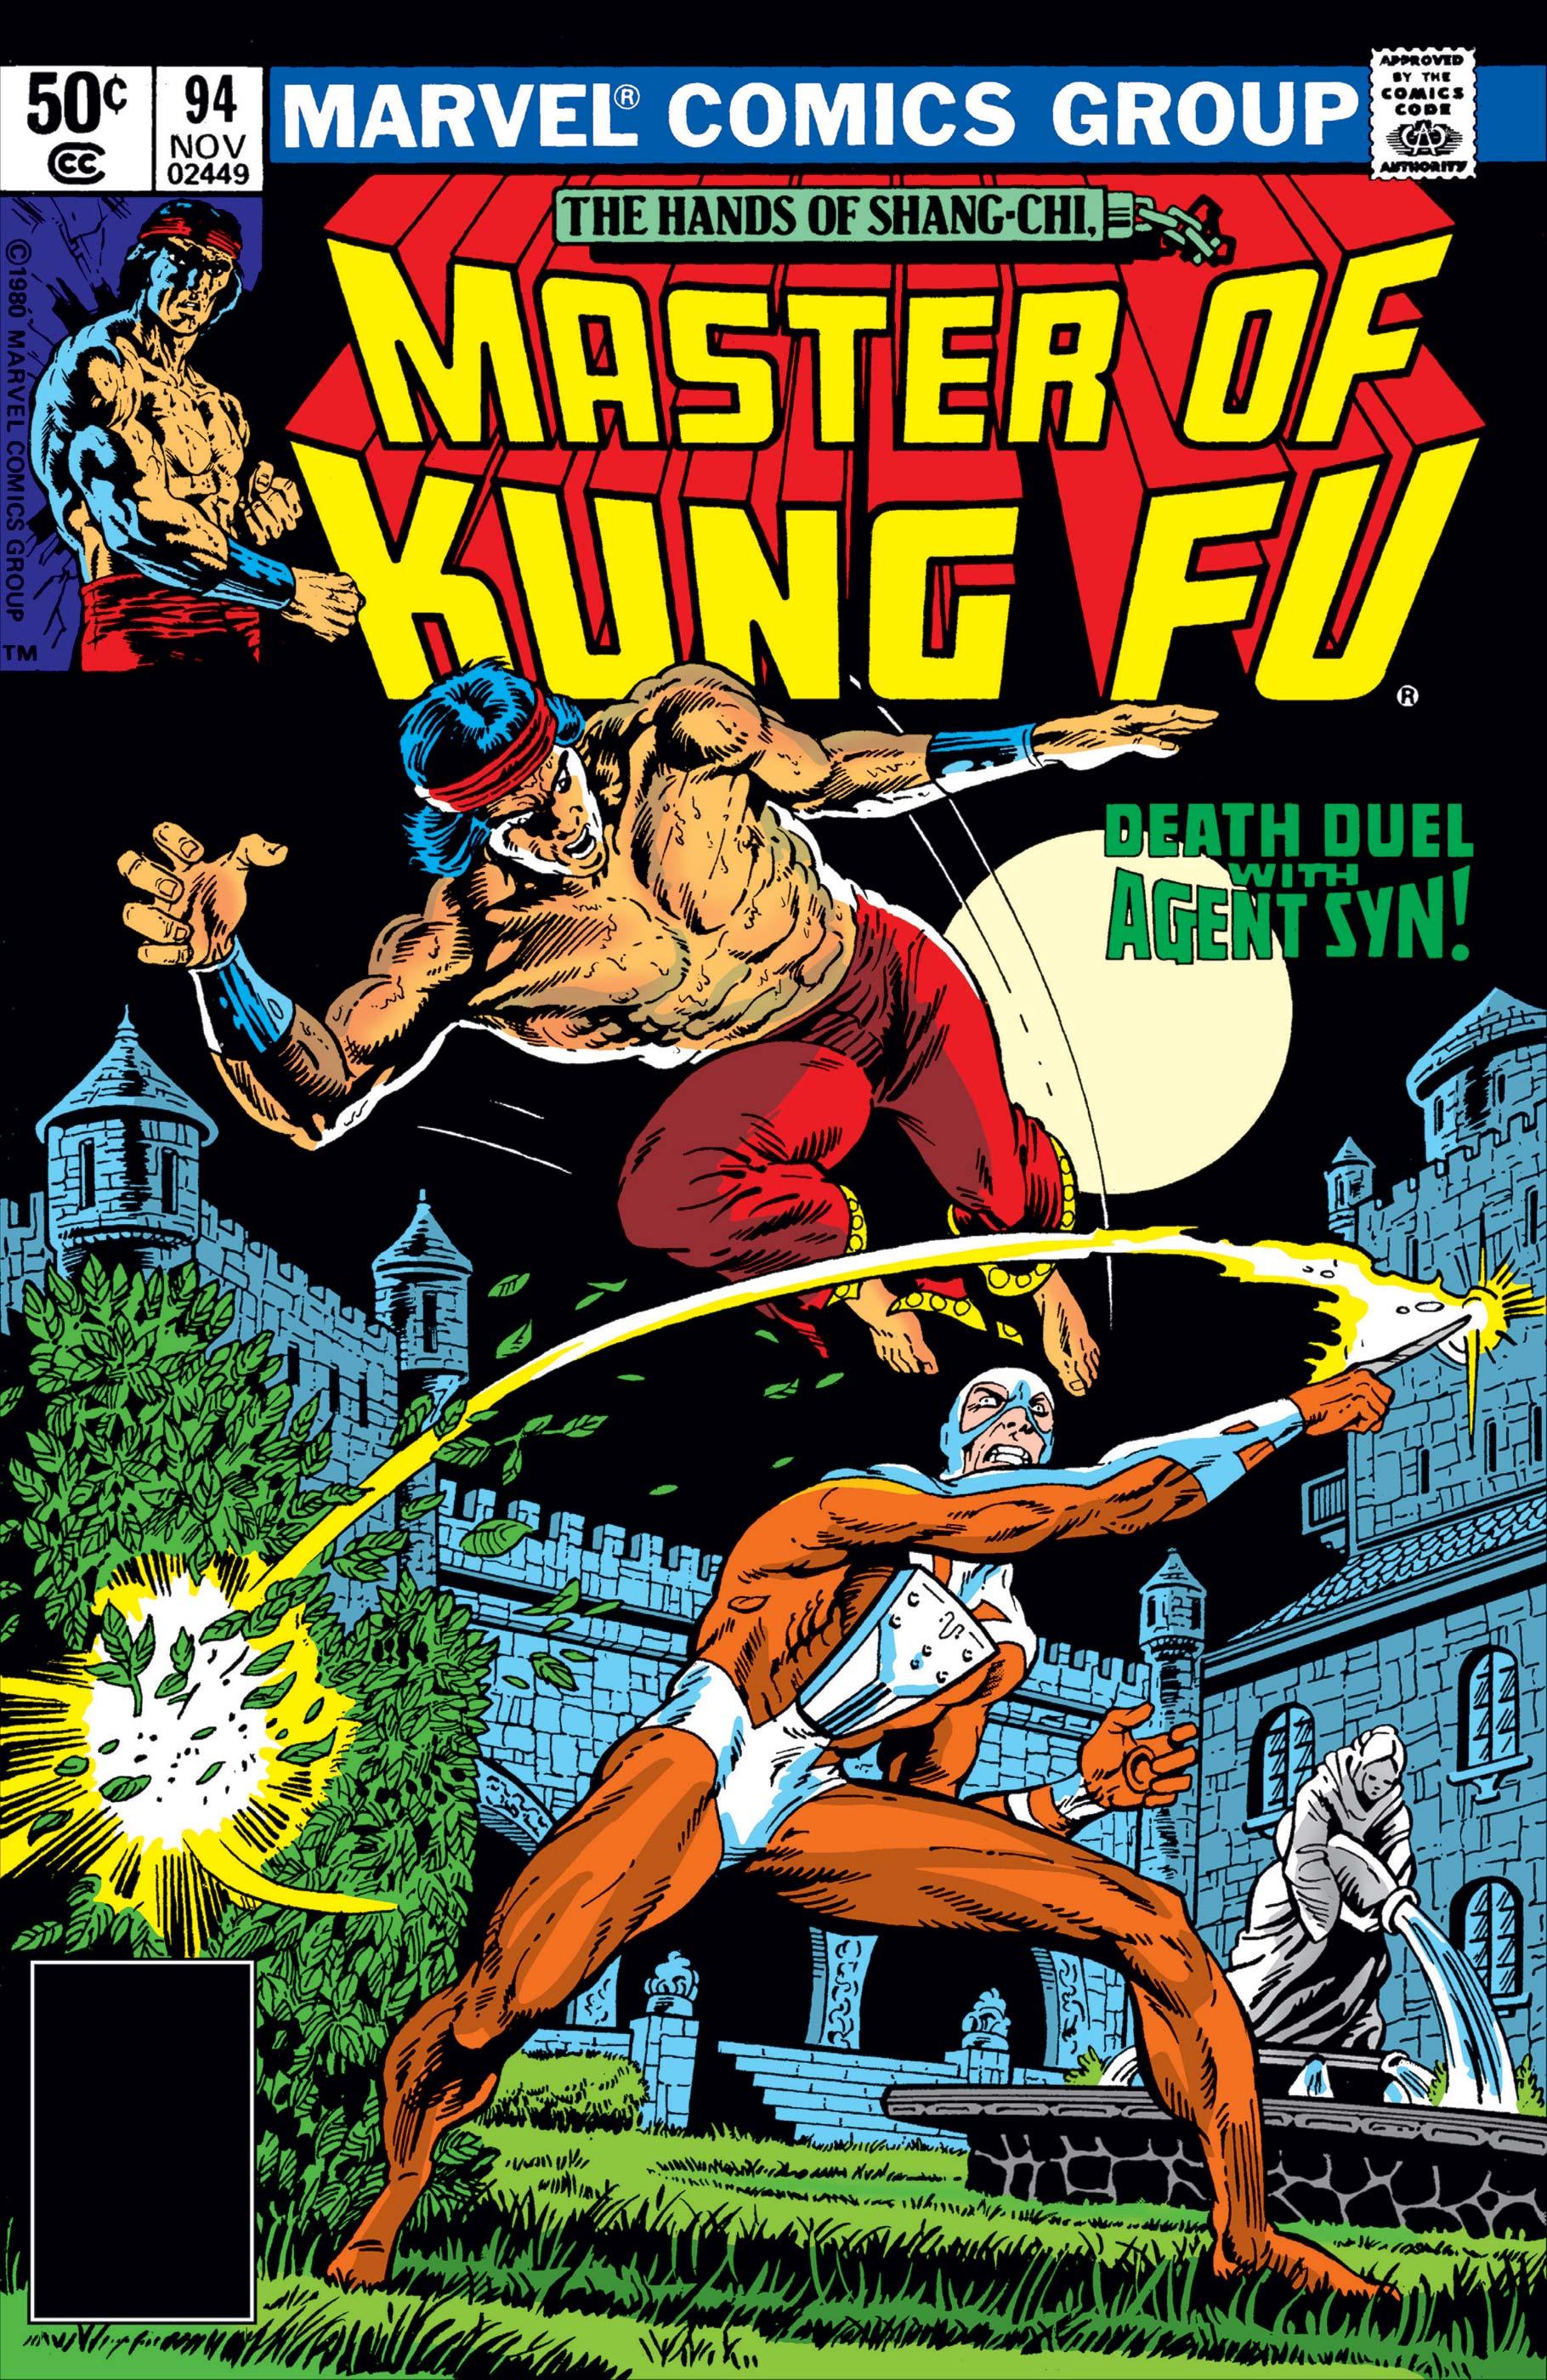 Master of Kung Fu (1974) #94